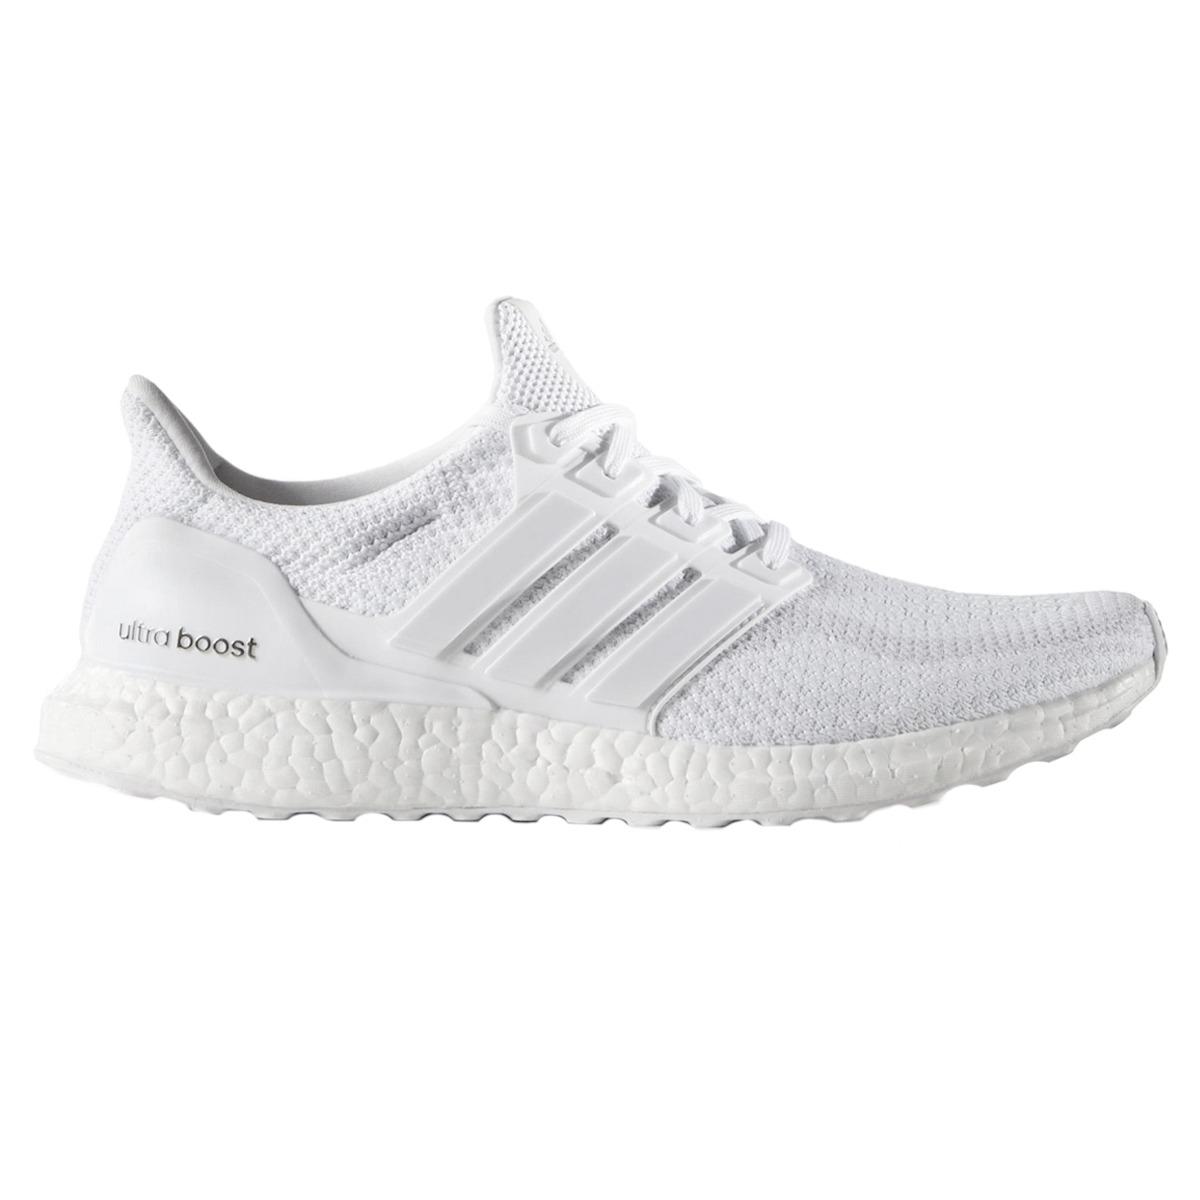 zapatillas adidas running ultraboost m hombre bl gr. Cargando zoom. e5ac111849d